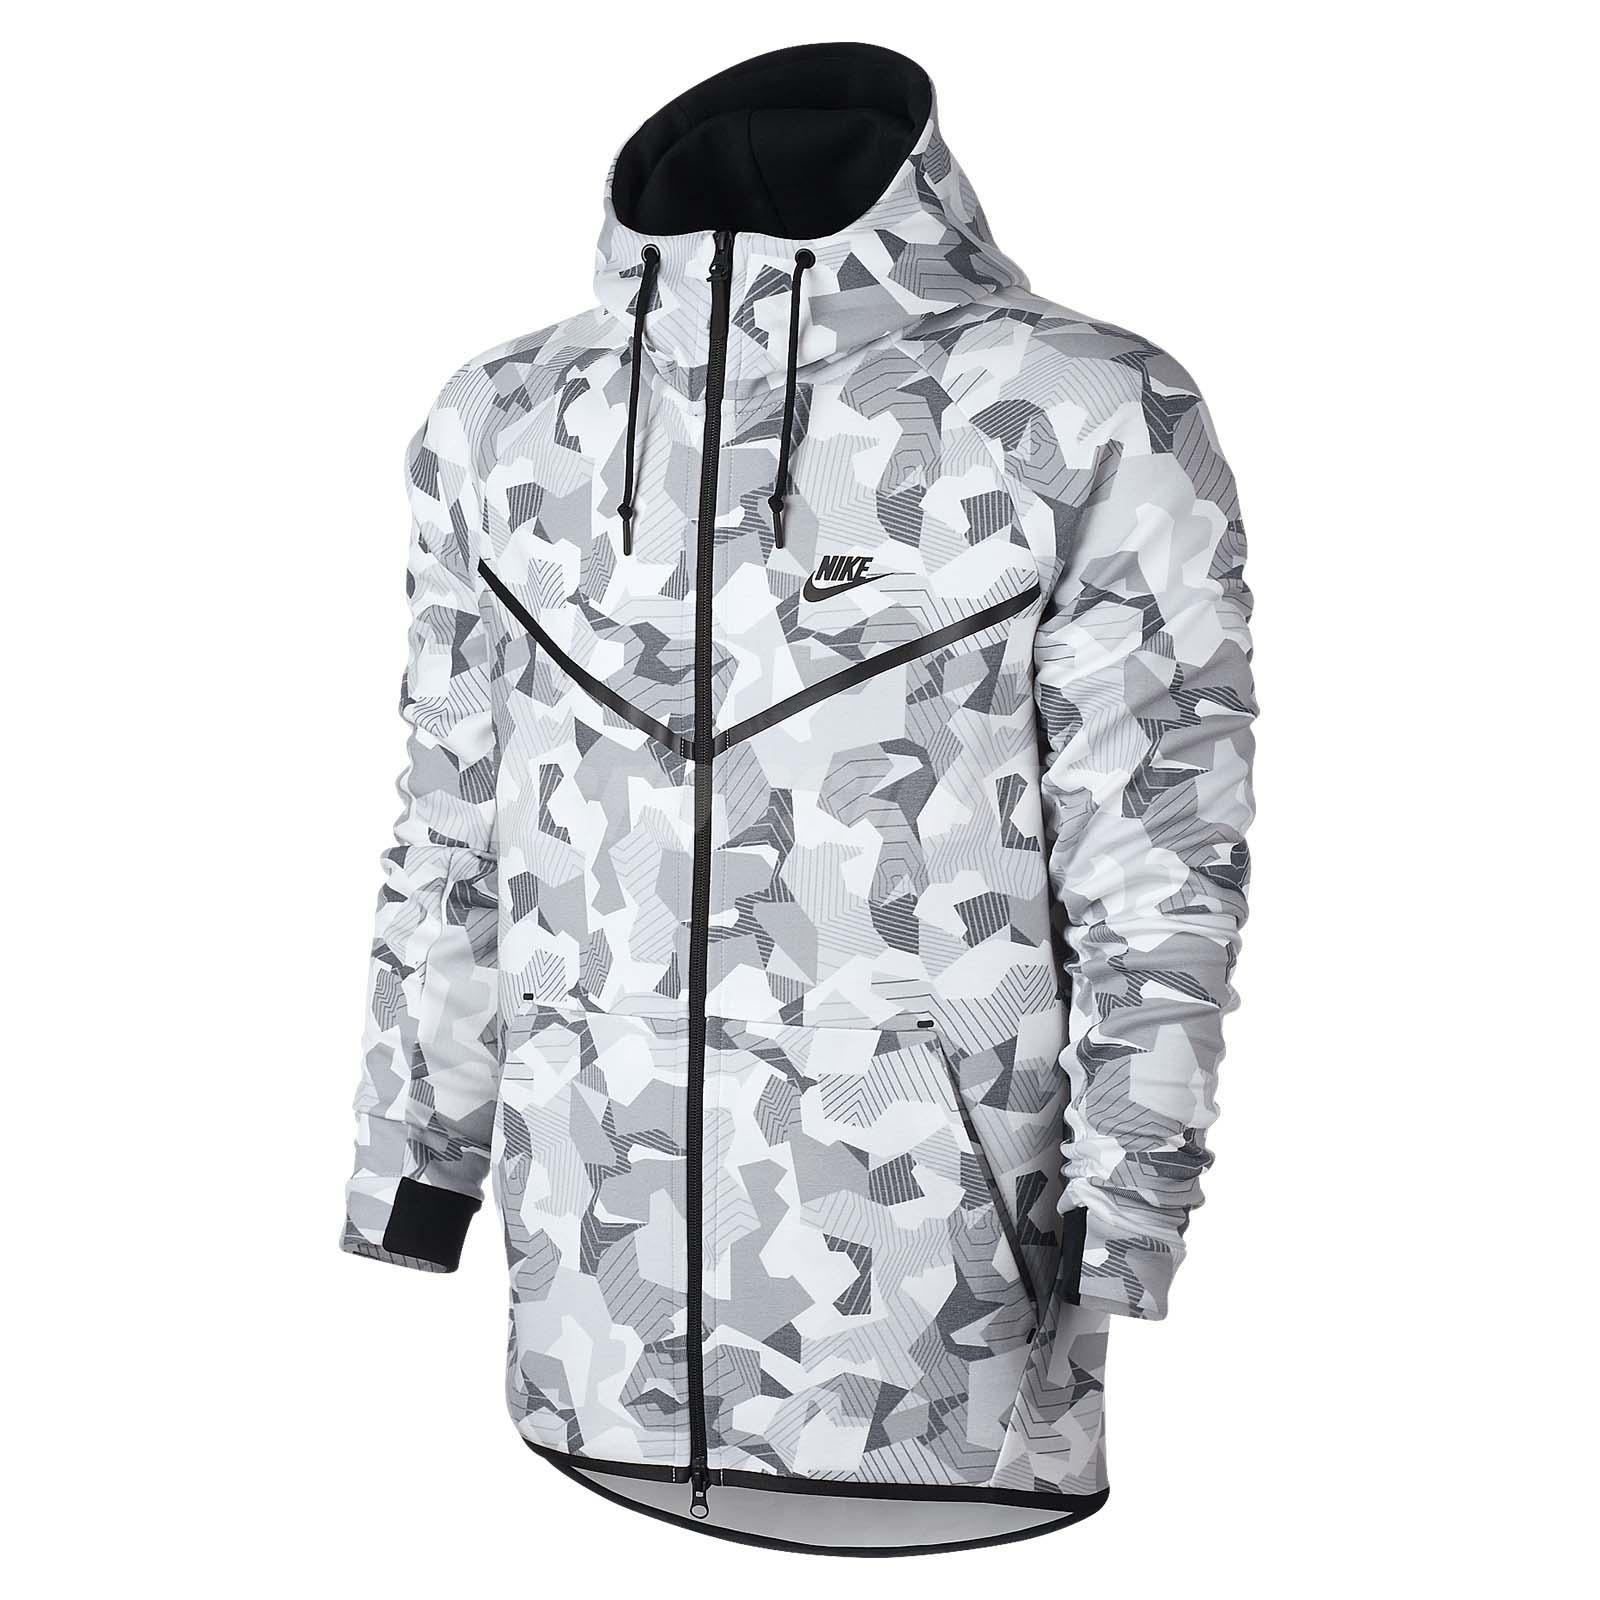 nike sportswear as tech fleece grey white camo mens. Black Bedroom Furniture Sets. Home Design Ideas